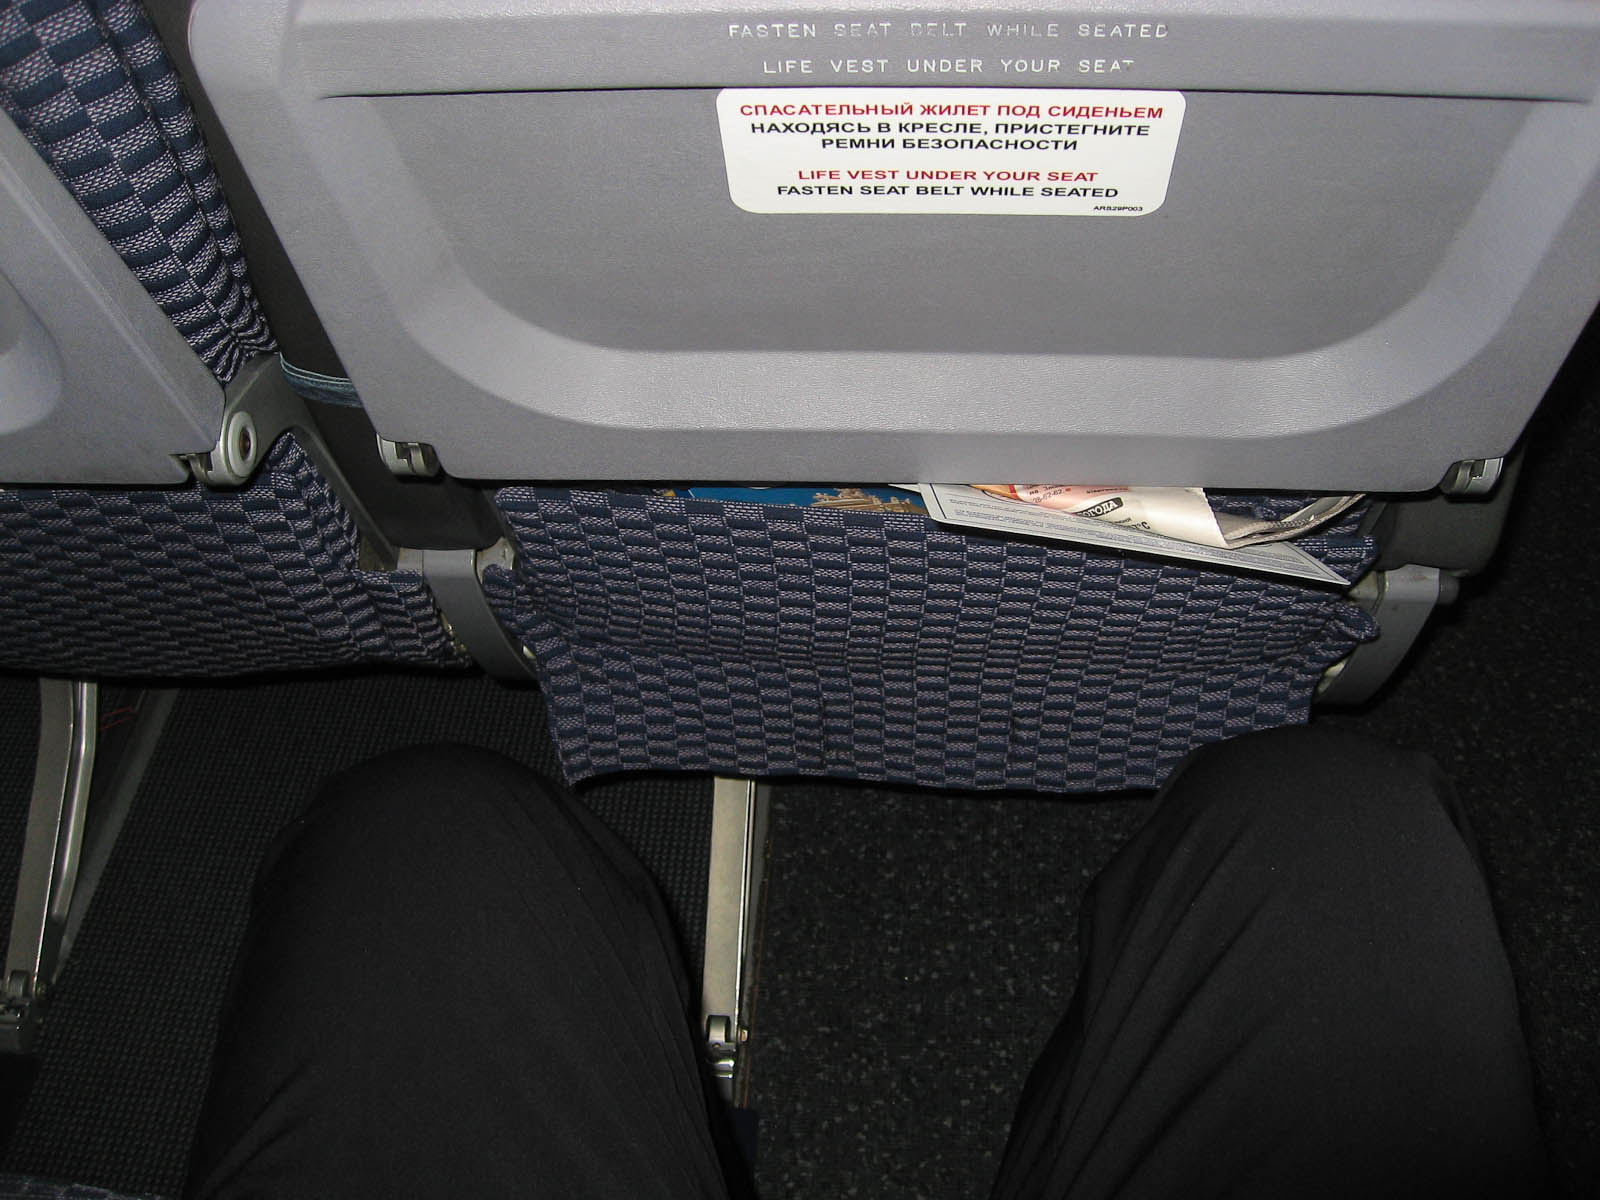 Кресла в самолете Боинг-737-500 авиакомпании ЮТэйр